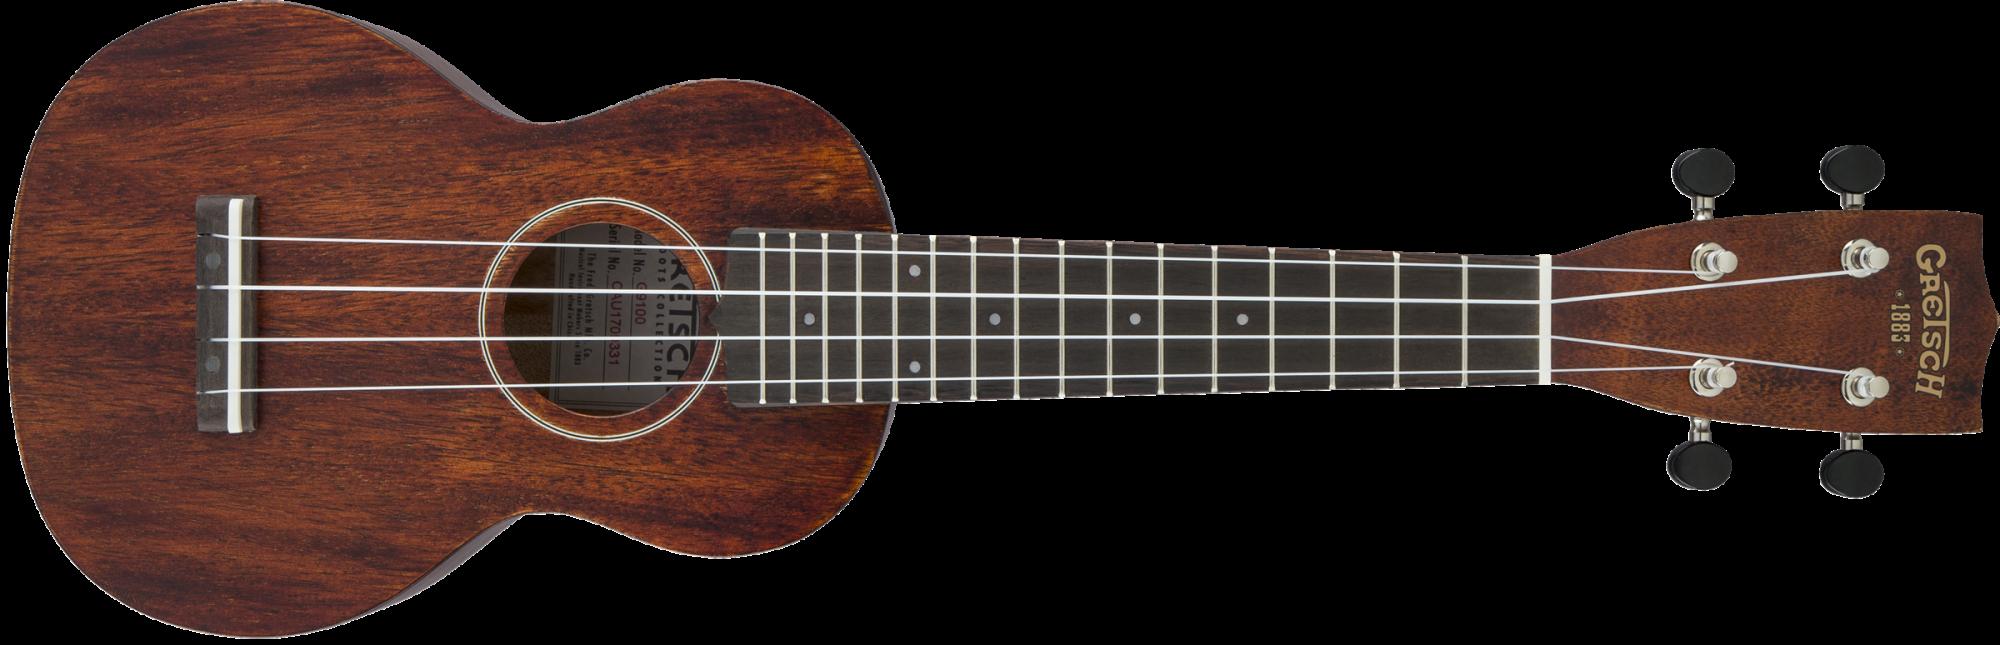 Gretsch G9100 Soprano Standard Ukulele with Gig Bag, Ovangkol Fingerboard, Vintage Mahogany Stain